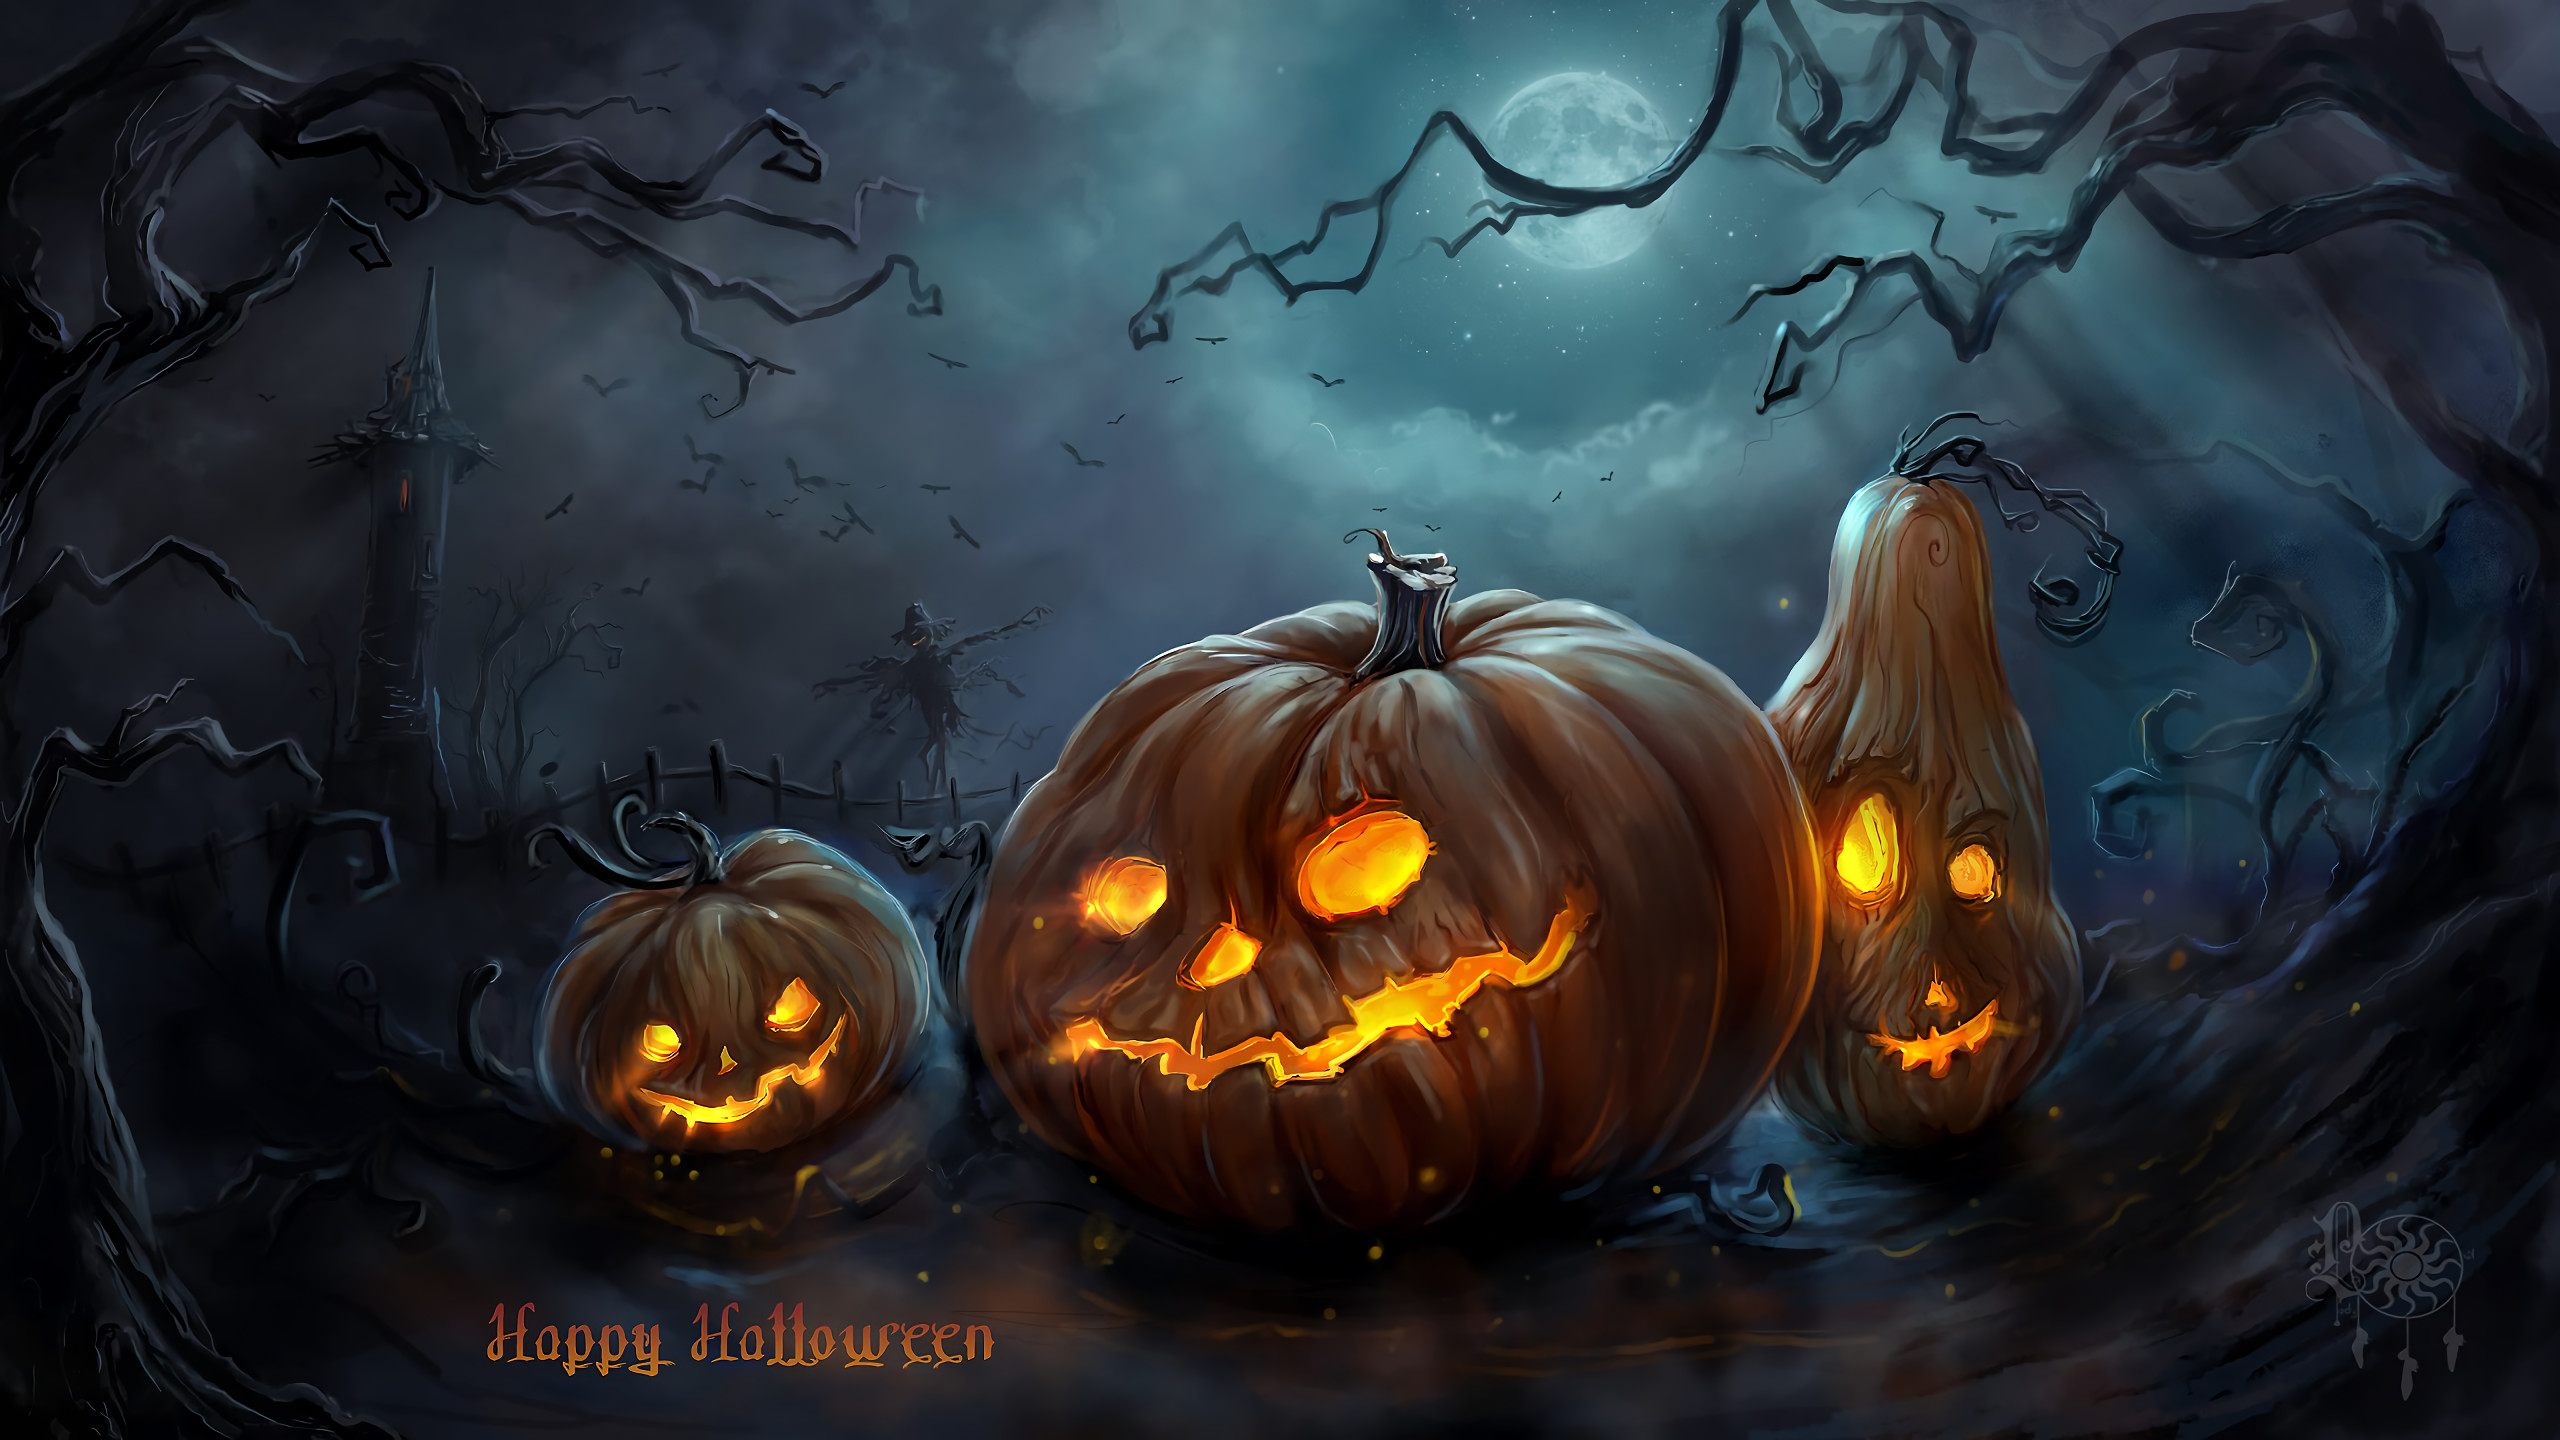 Halloween Background Hd.Halloween Backgrounds Wallpaper Wallpapertag